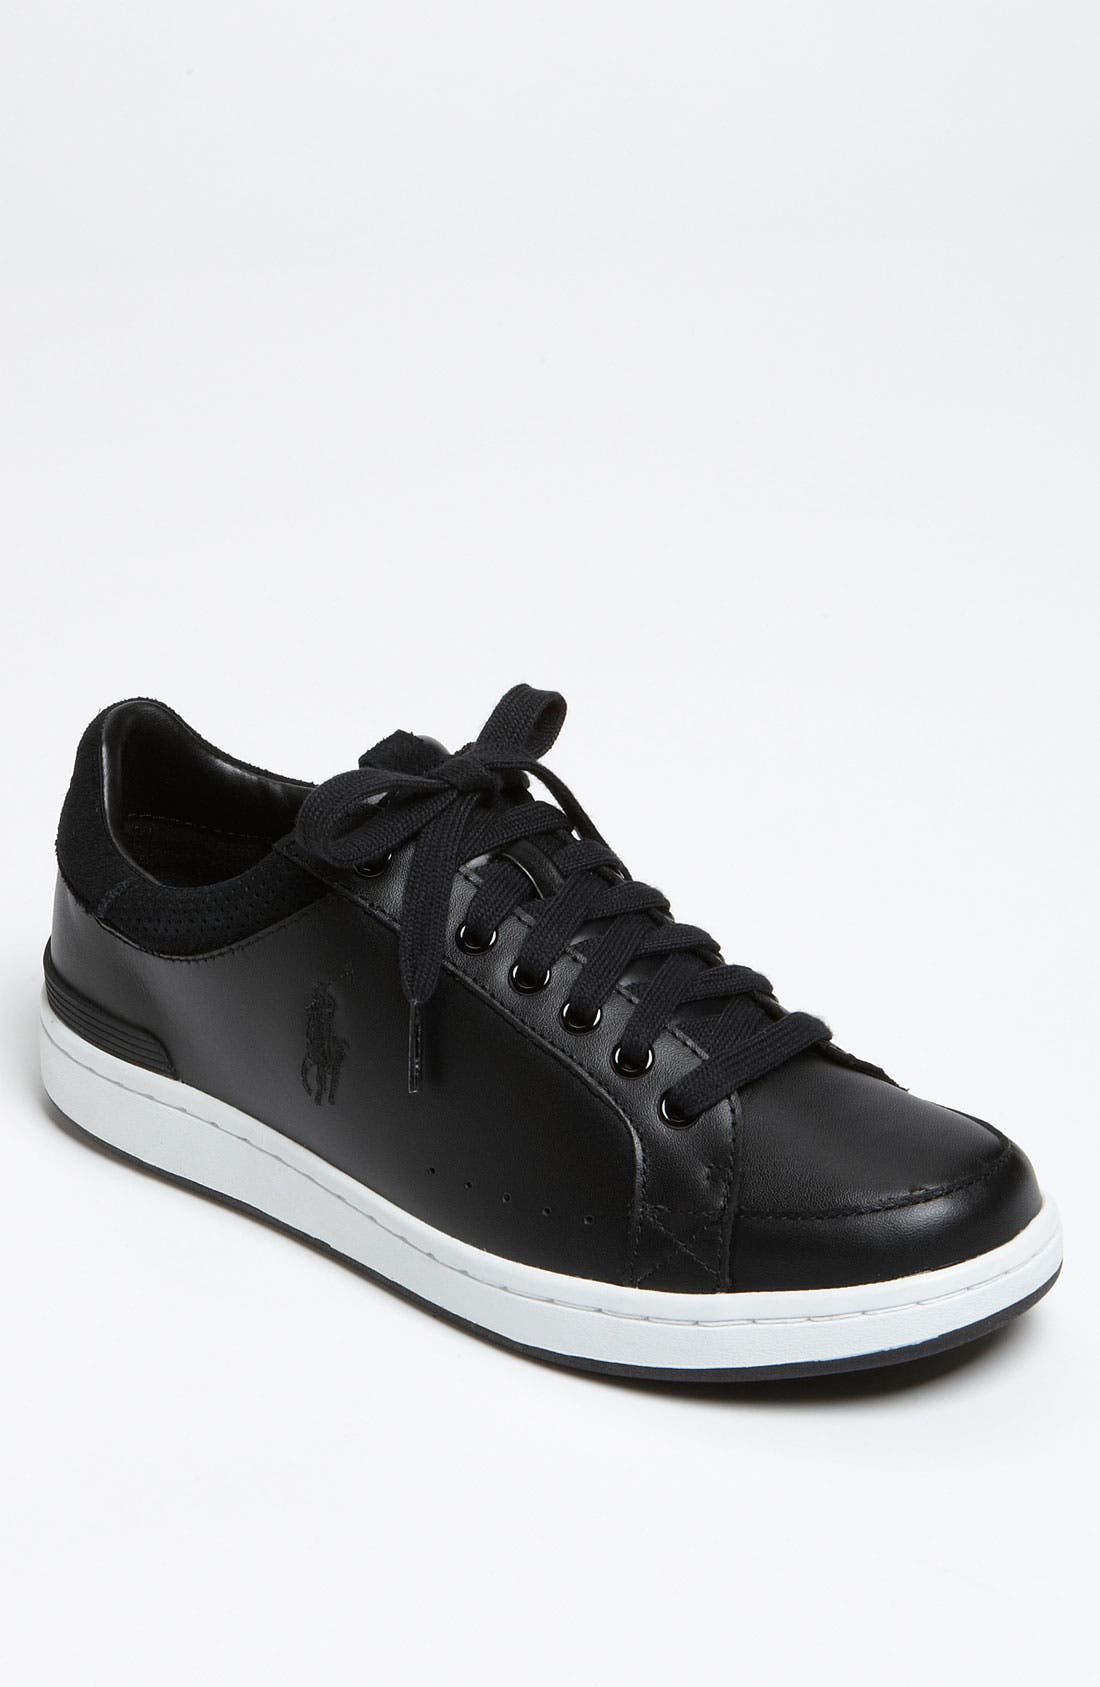 Main Image - Polo Ralph Lauren 'Talbert' Sneaker